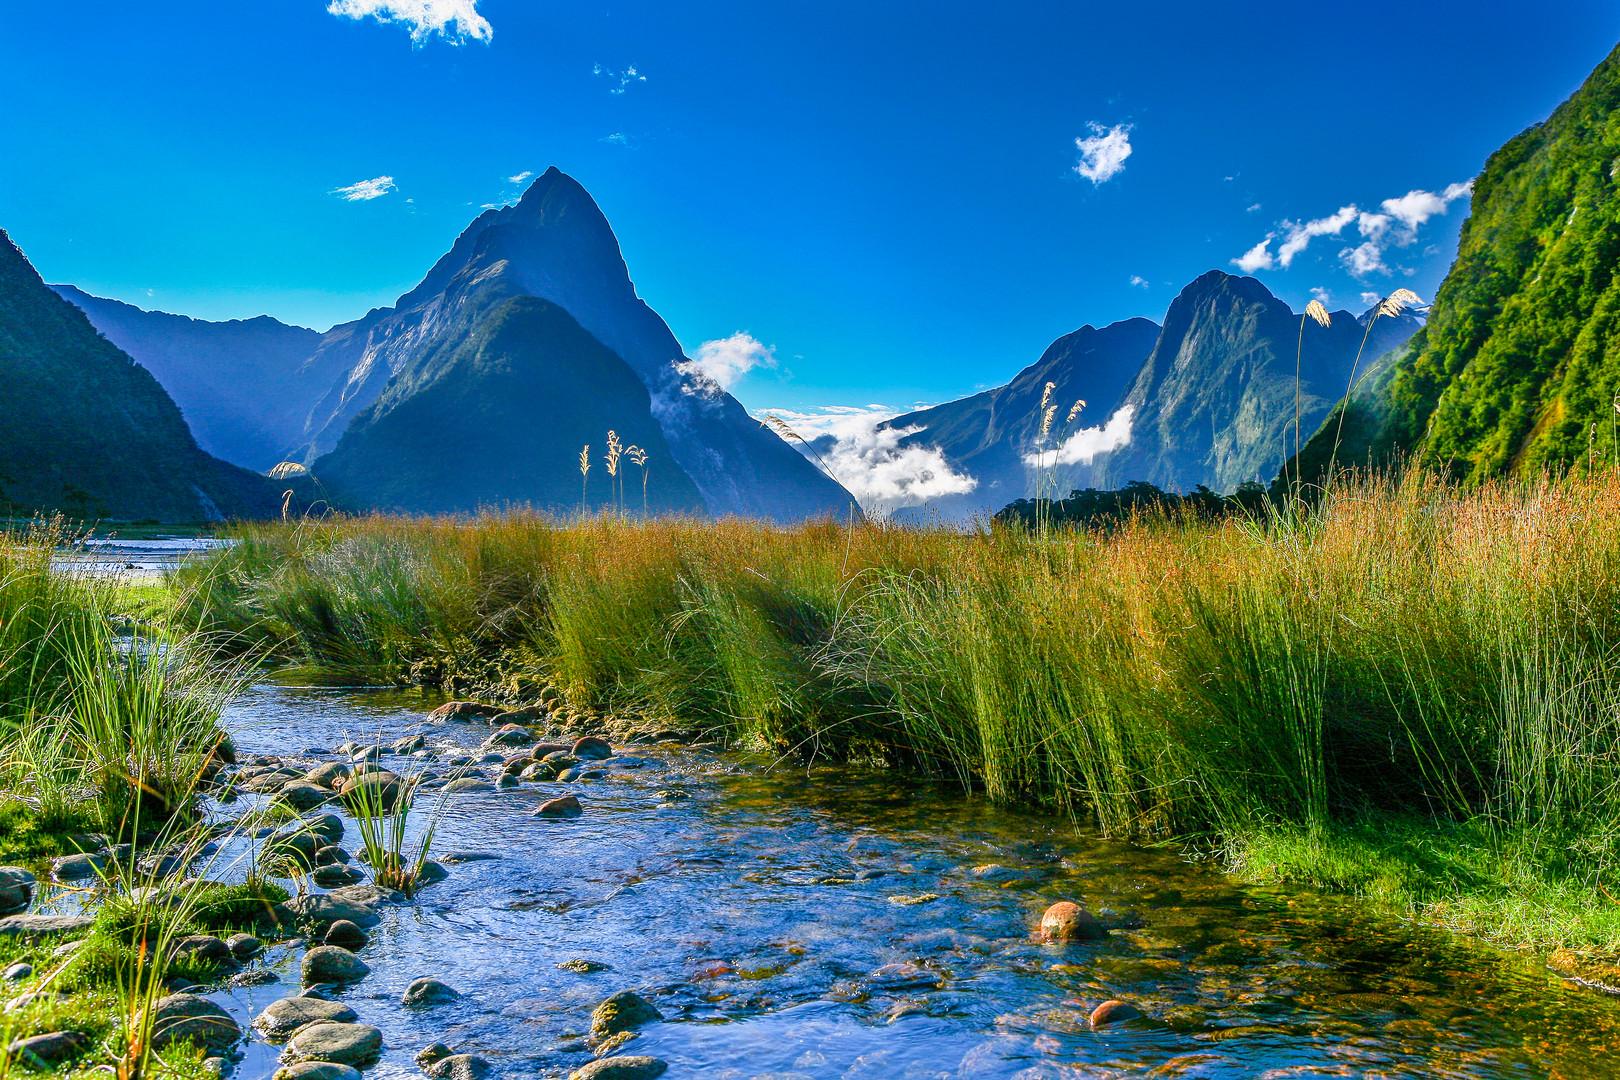 Amoklauf Neuseeland Video Pinterest: Milford Sound Neuseeland Foto & Bild